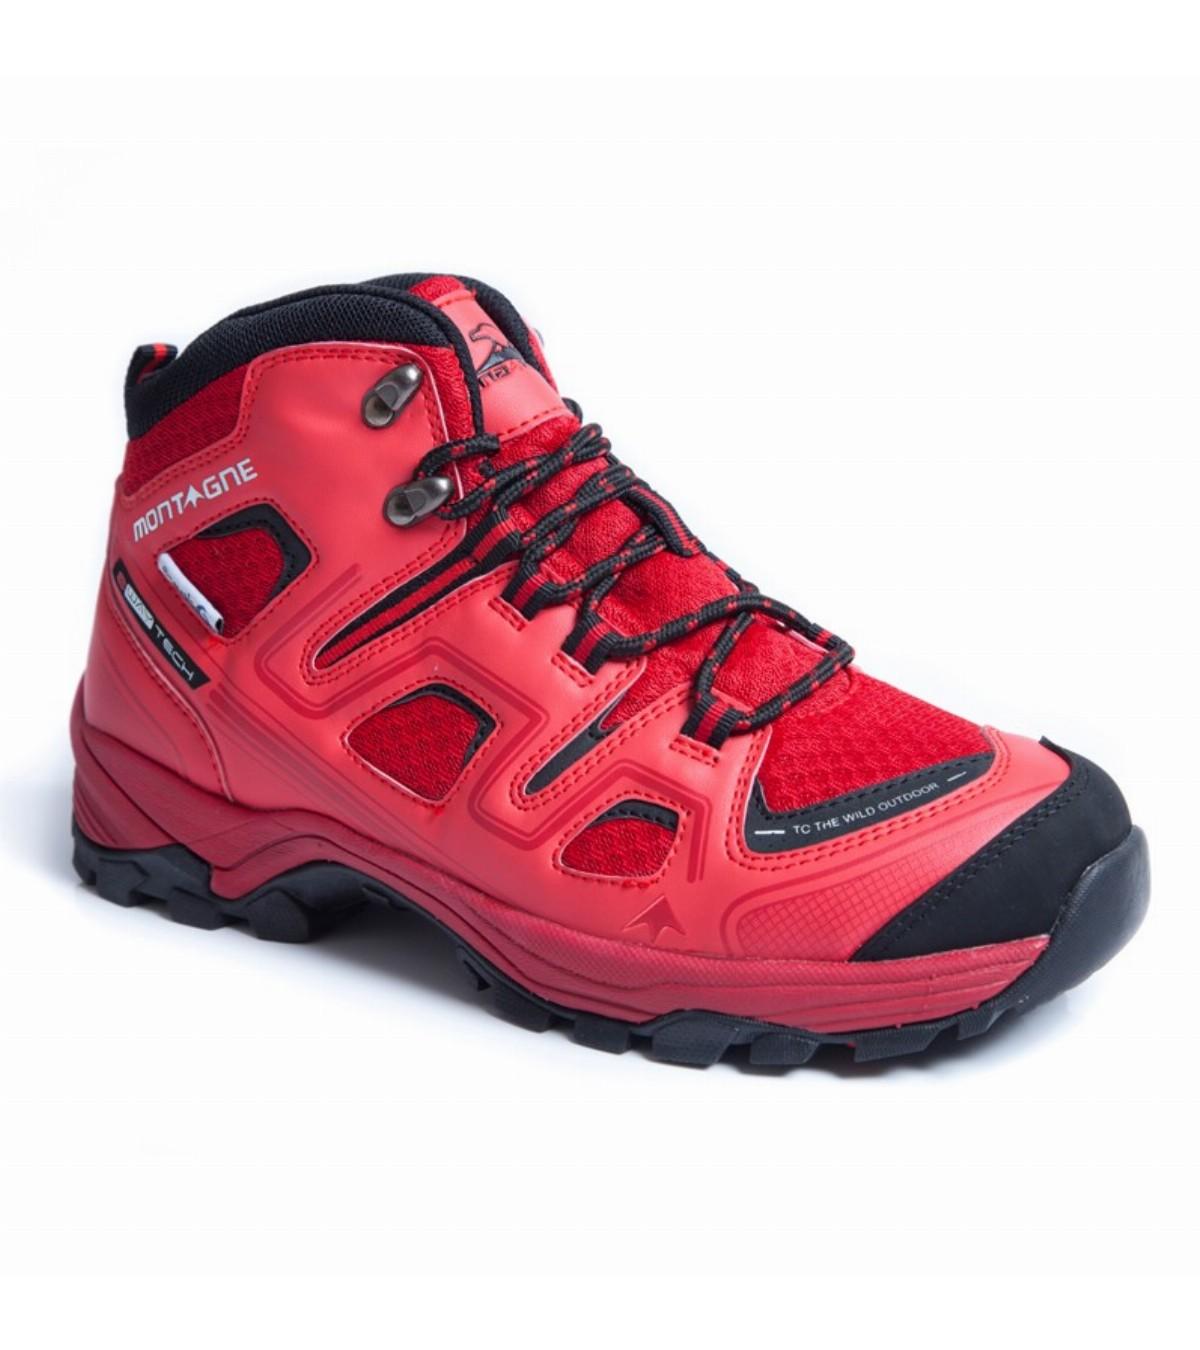 Botas de mujer Piggot - Zapatillas Montagne de mujer PIGGOTT